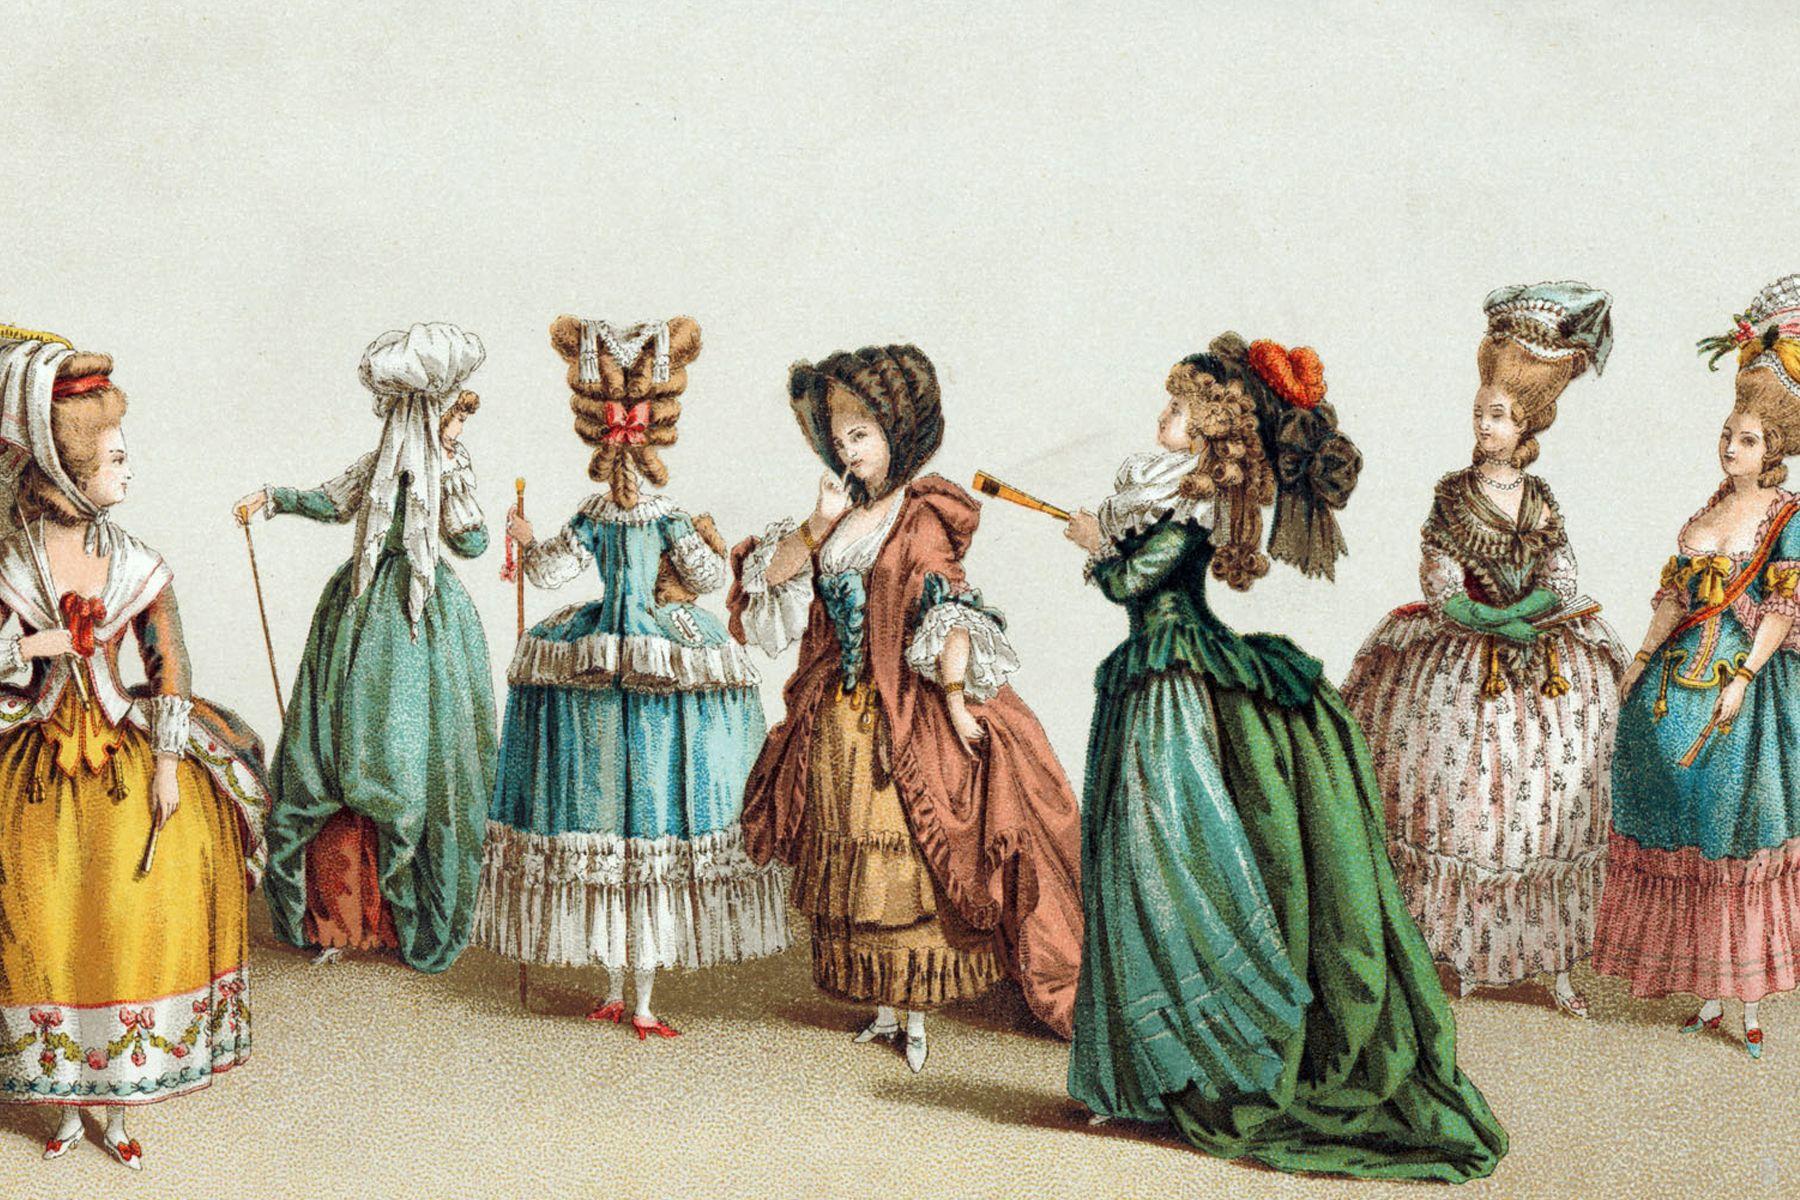 The fierce fashion history quiz fashion history lifestyle and fashion